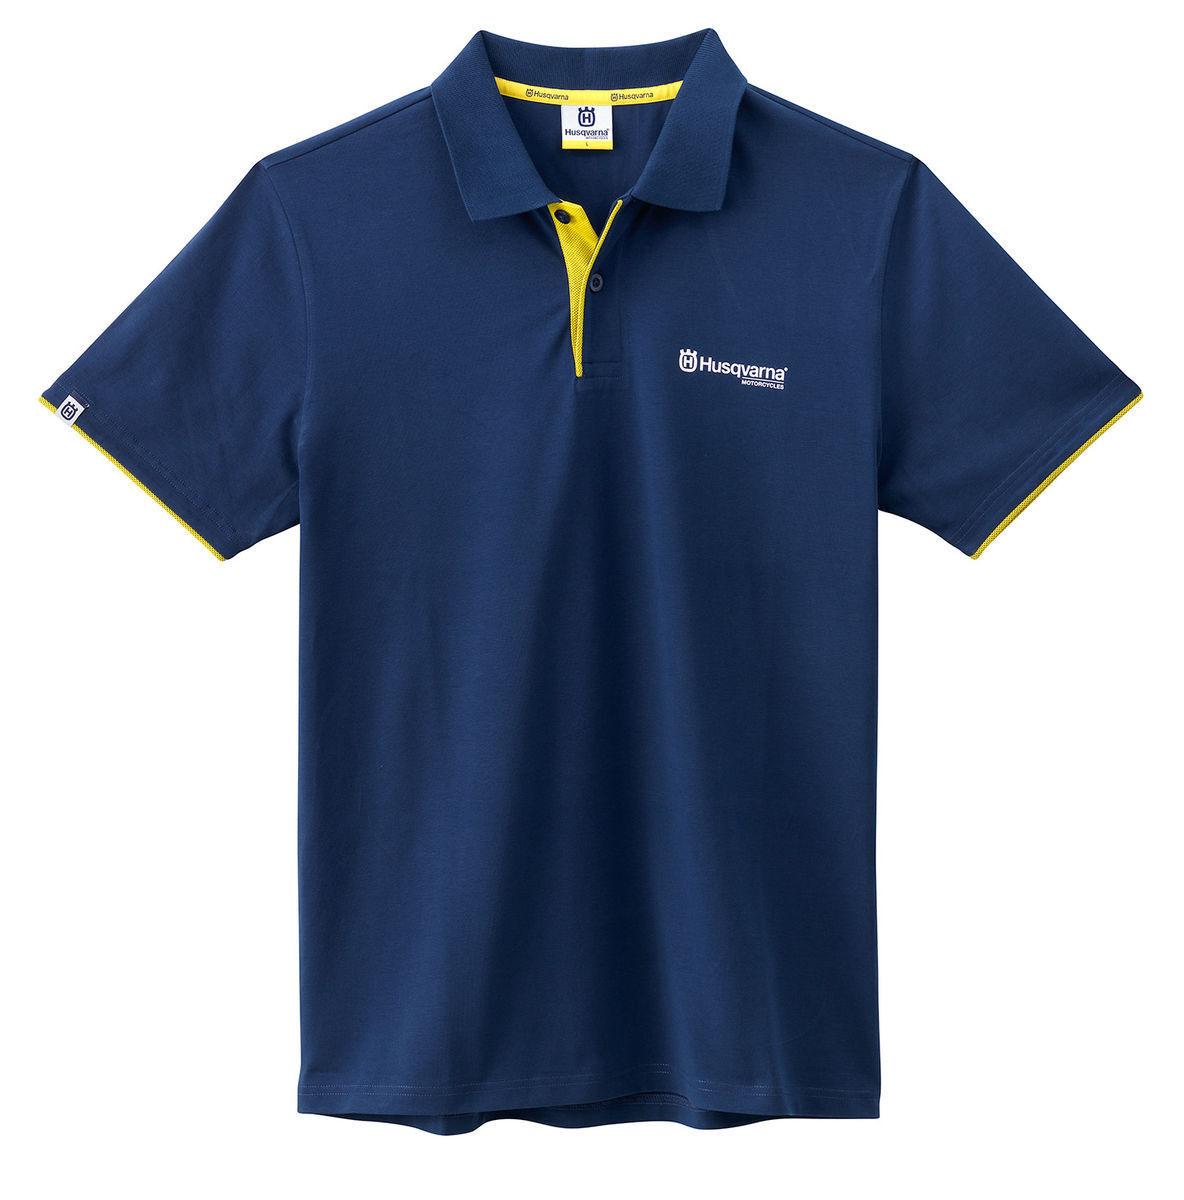 HUSQVARNA CLASSIC POLO   HUSQVARNA CASUAL CLOTHING   3HS1756103